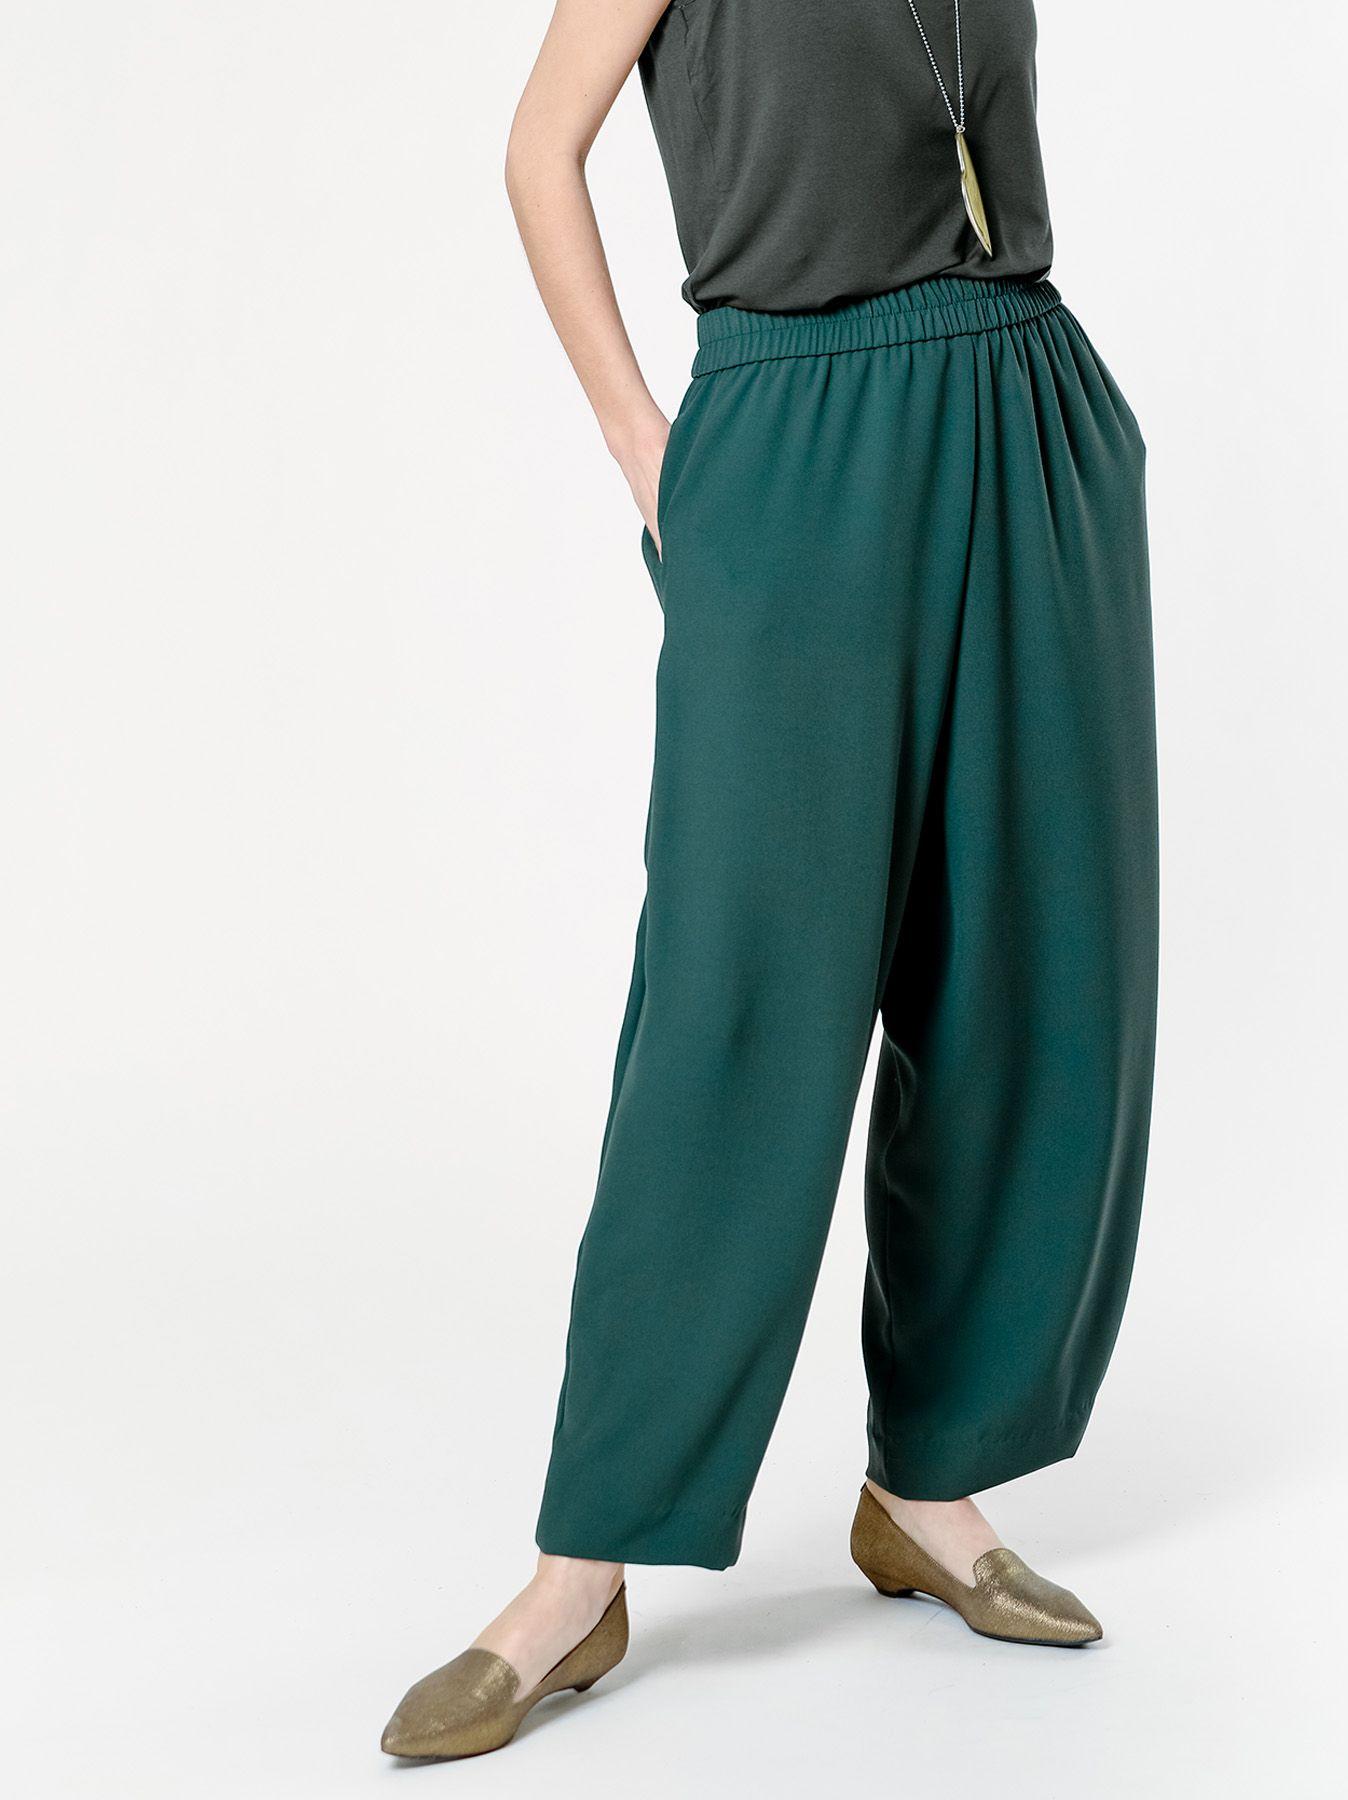 Pantalone gaucho in tessuto cady